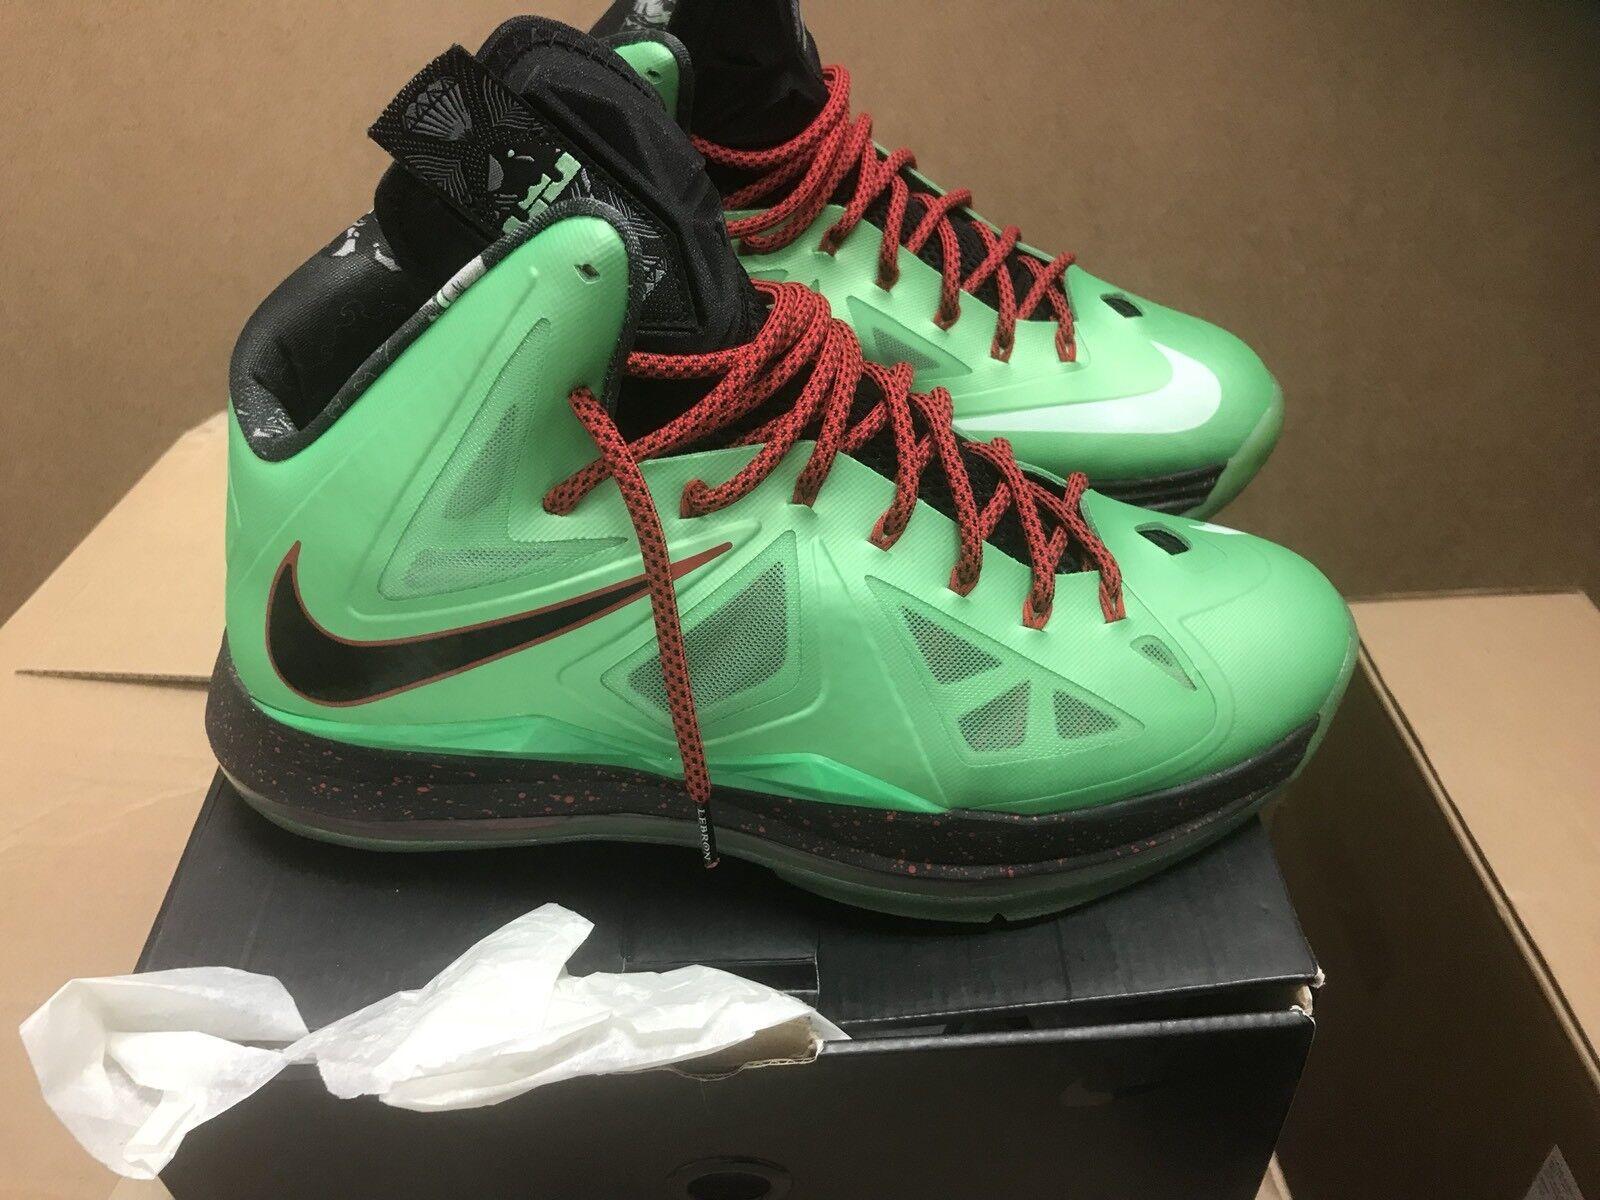 Nike Nike Nike Lebron X Cutting Jade Air Max Flywire 12 W Box 541100-303 8.5 10 b49847